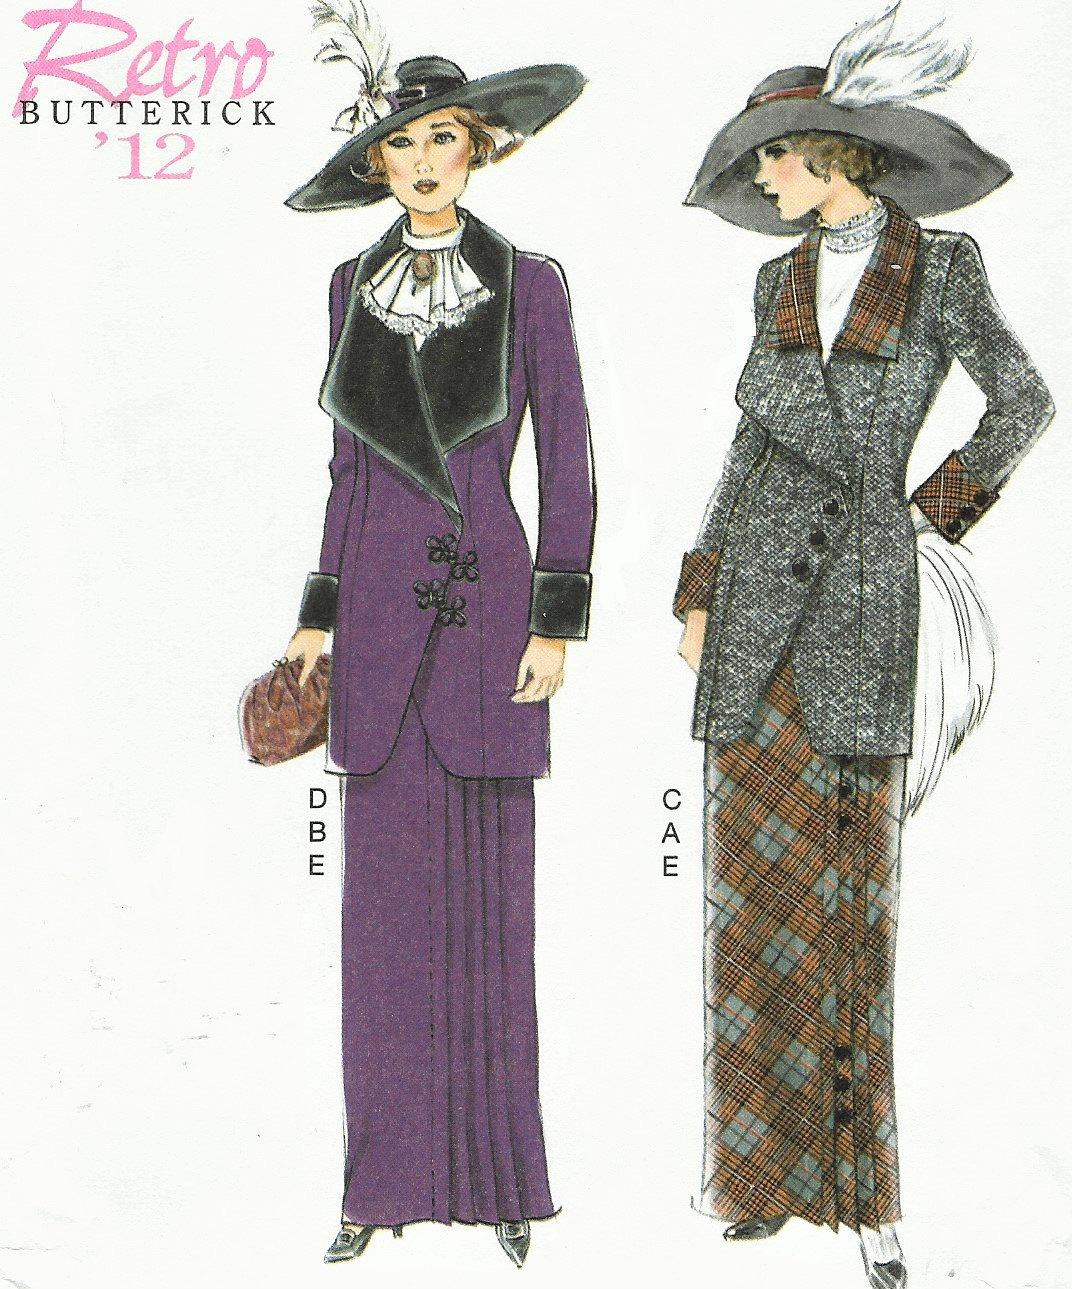 Retro-1912 Damenjacke Lätzchen und Rock Butt Nähen Muster